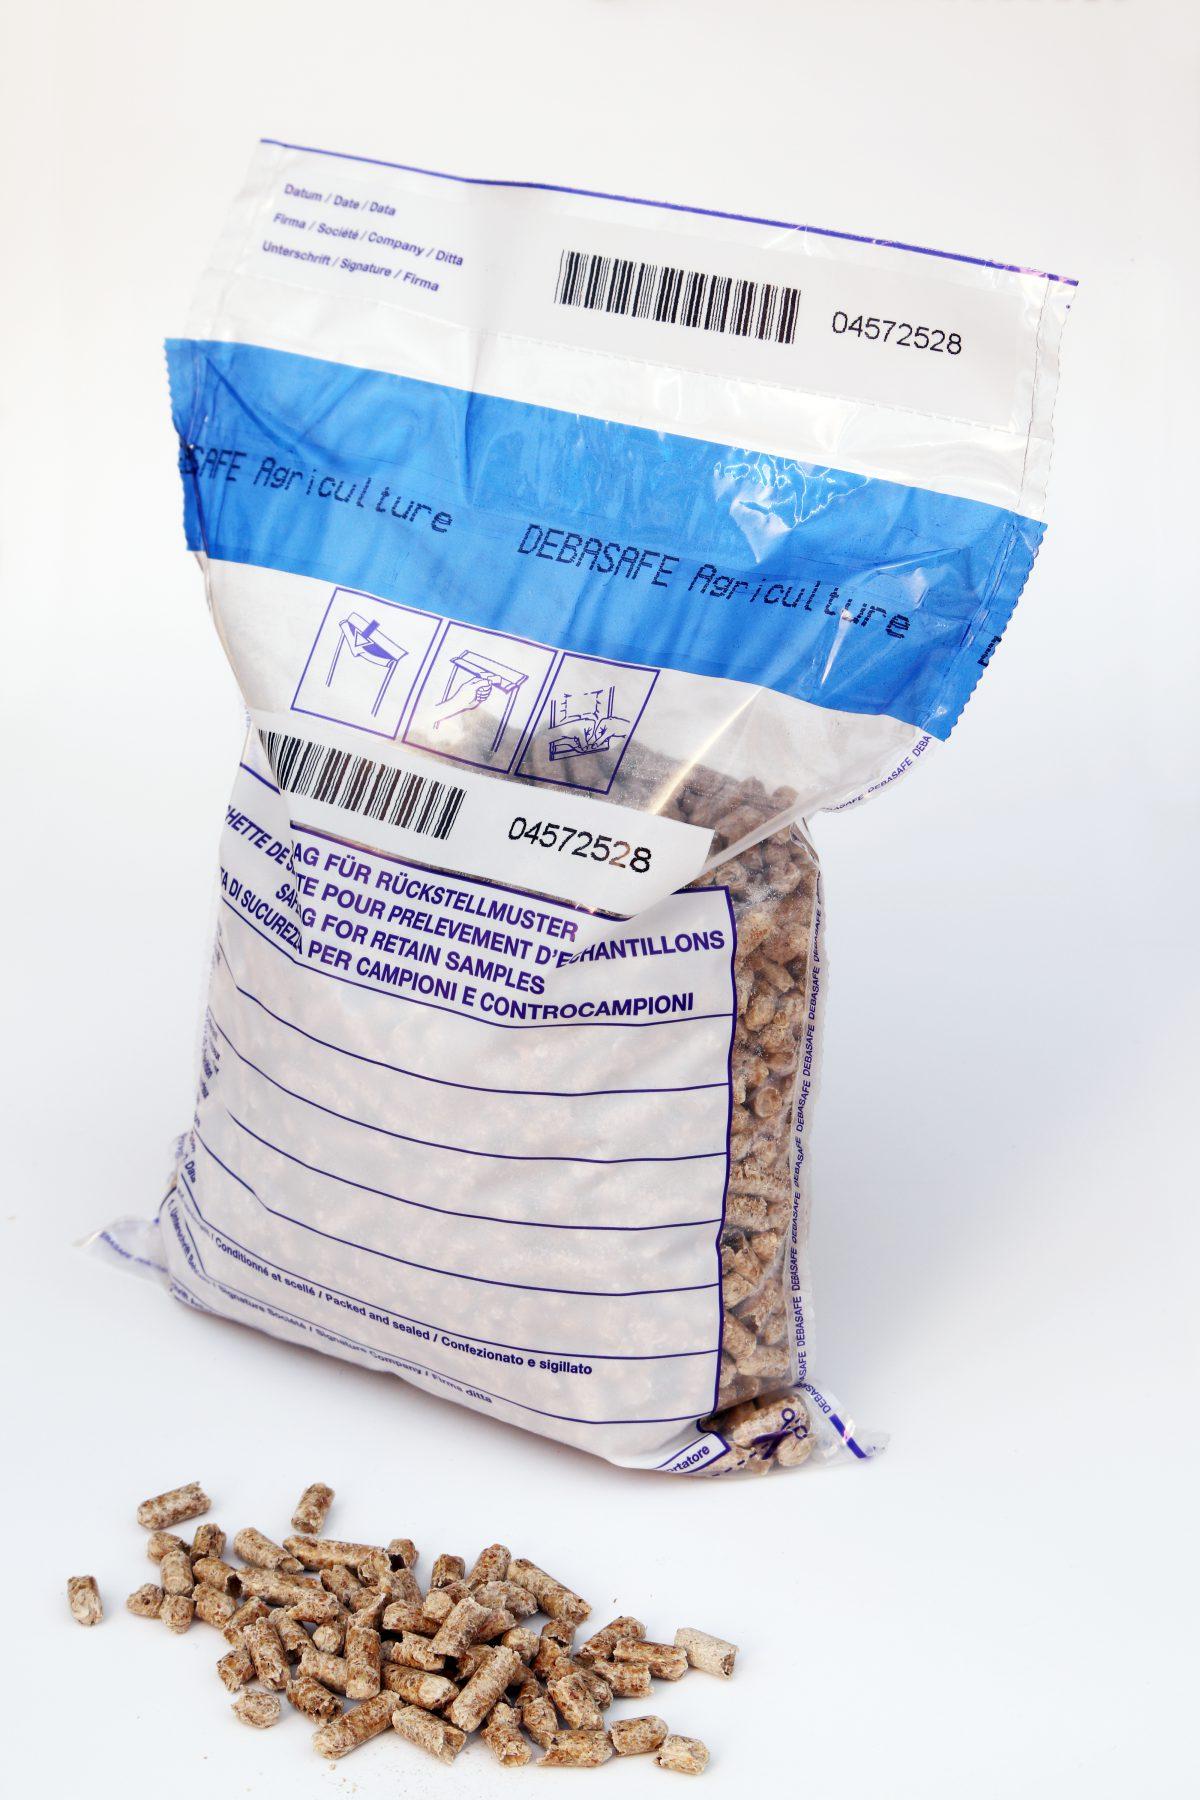 DEBASAFE wood pellet reference samples